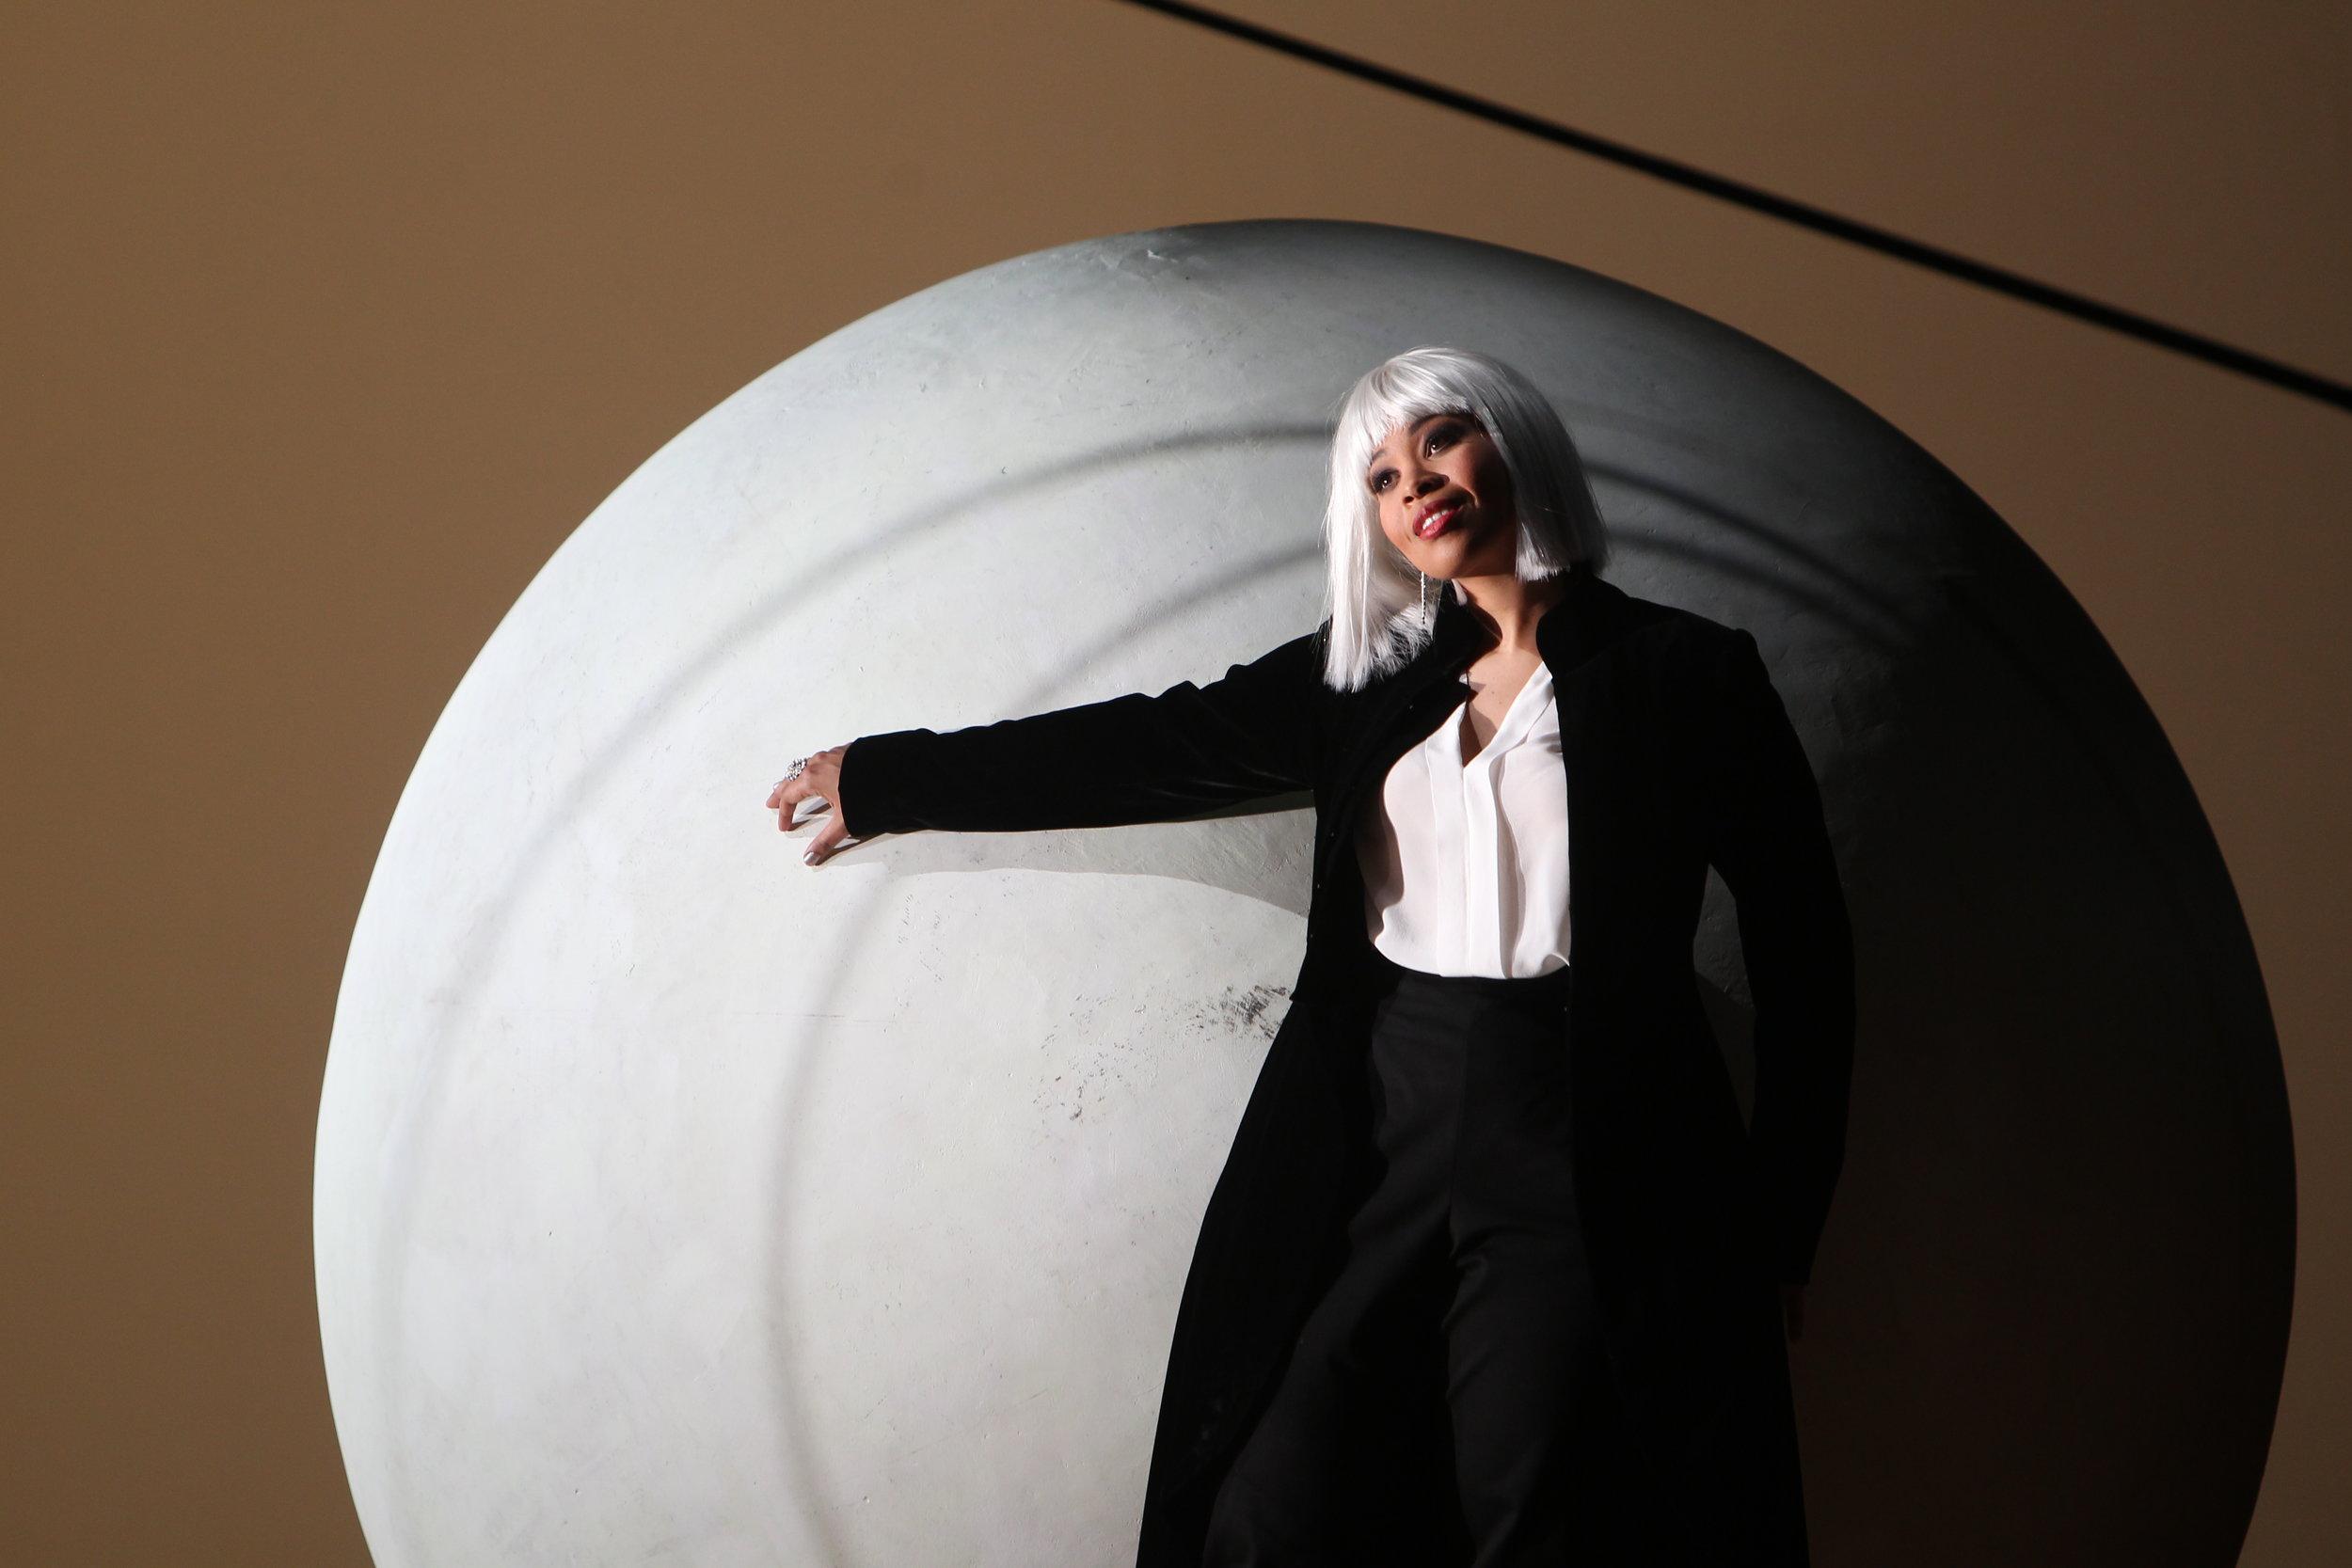 Sibilla in World Premiere of  La bianca notte  at Staatsoper Hamburg. Photo by örg Landsberg